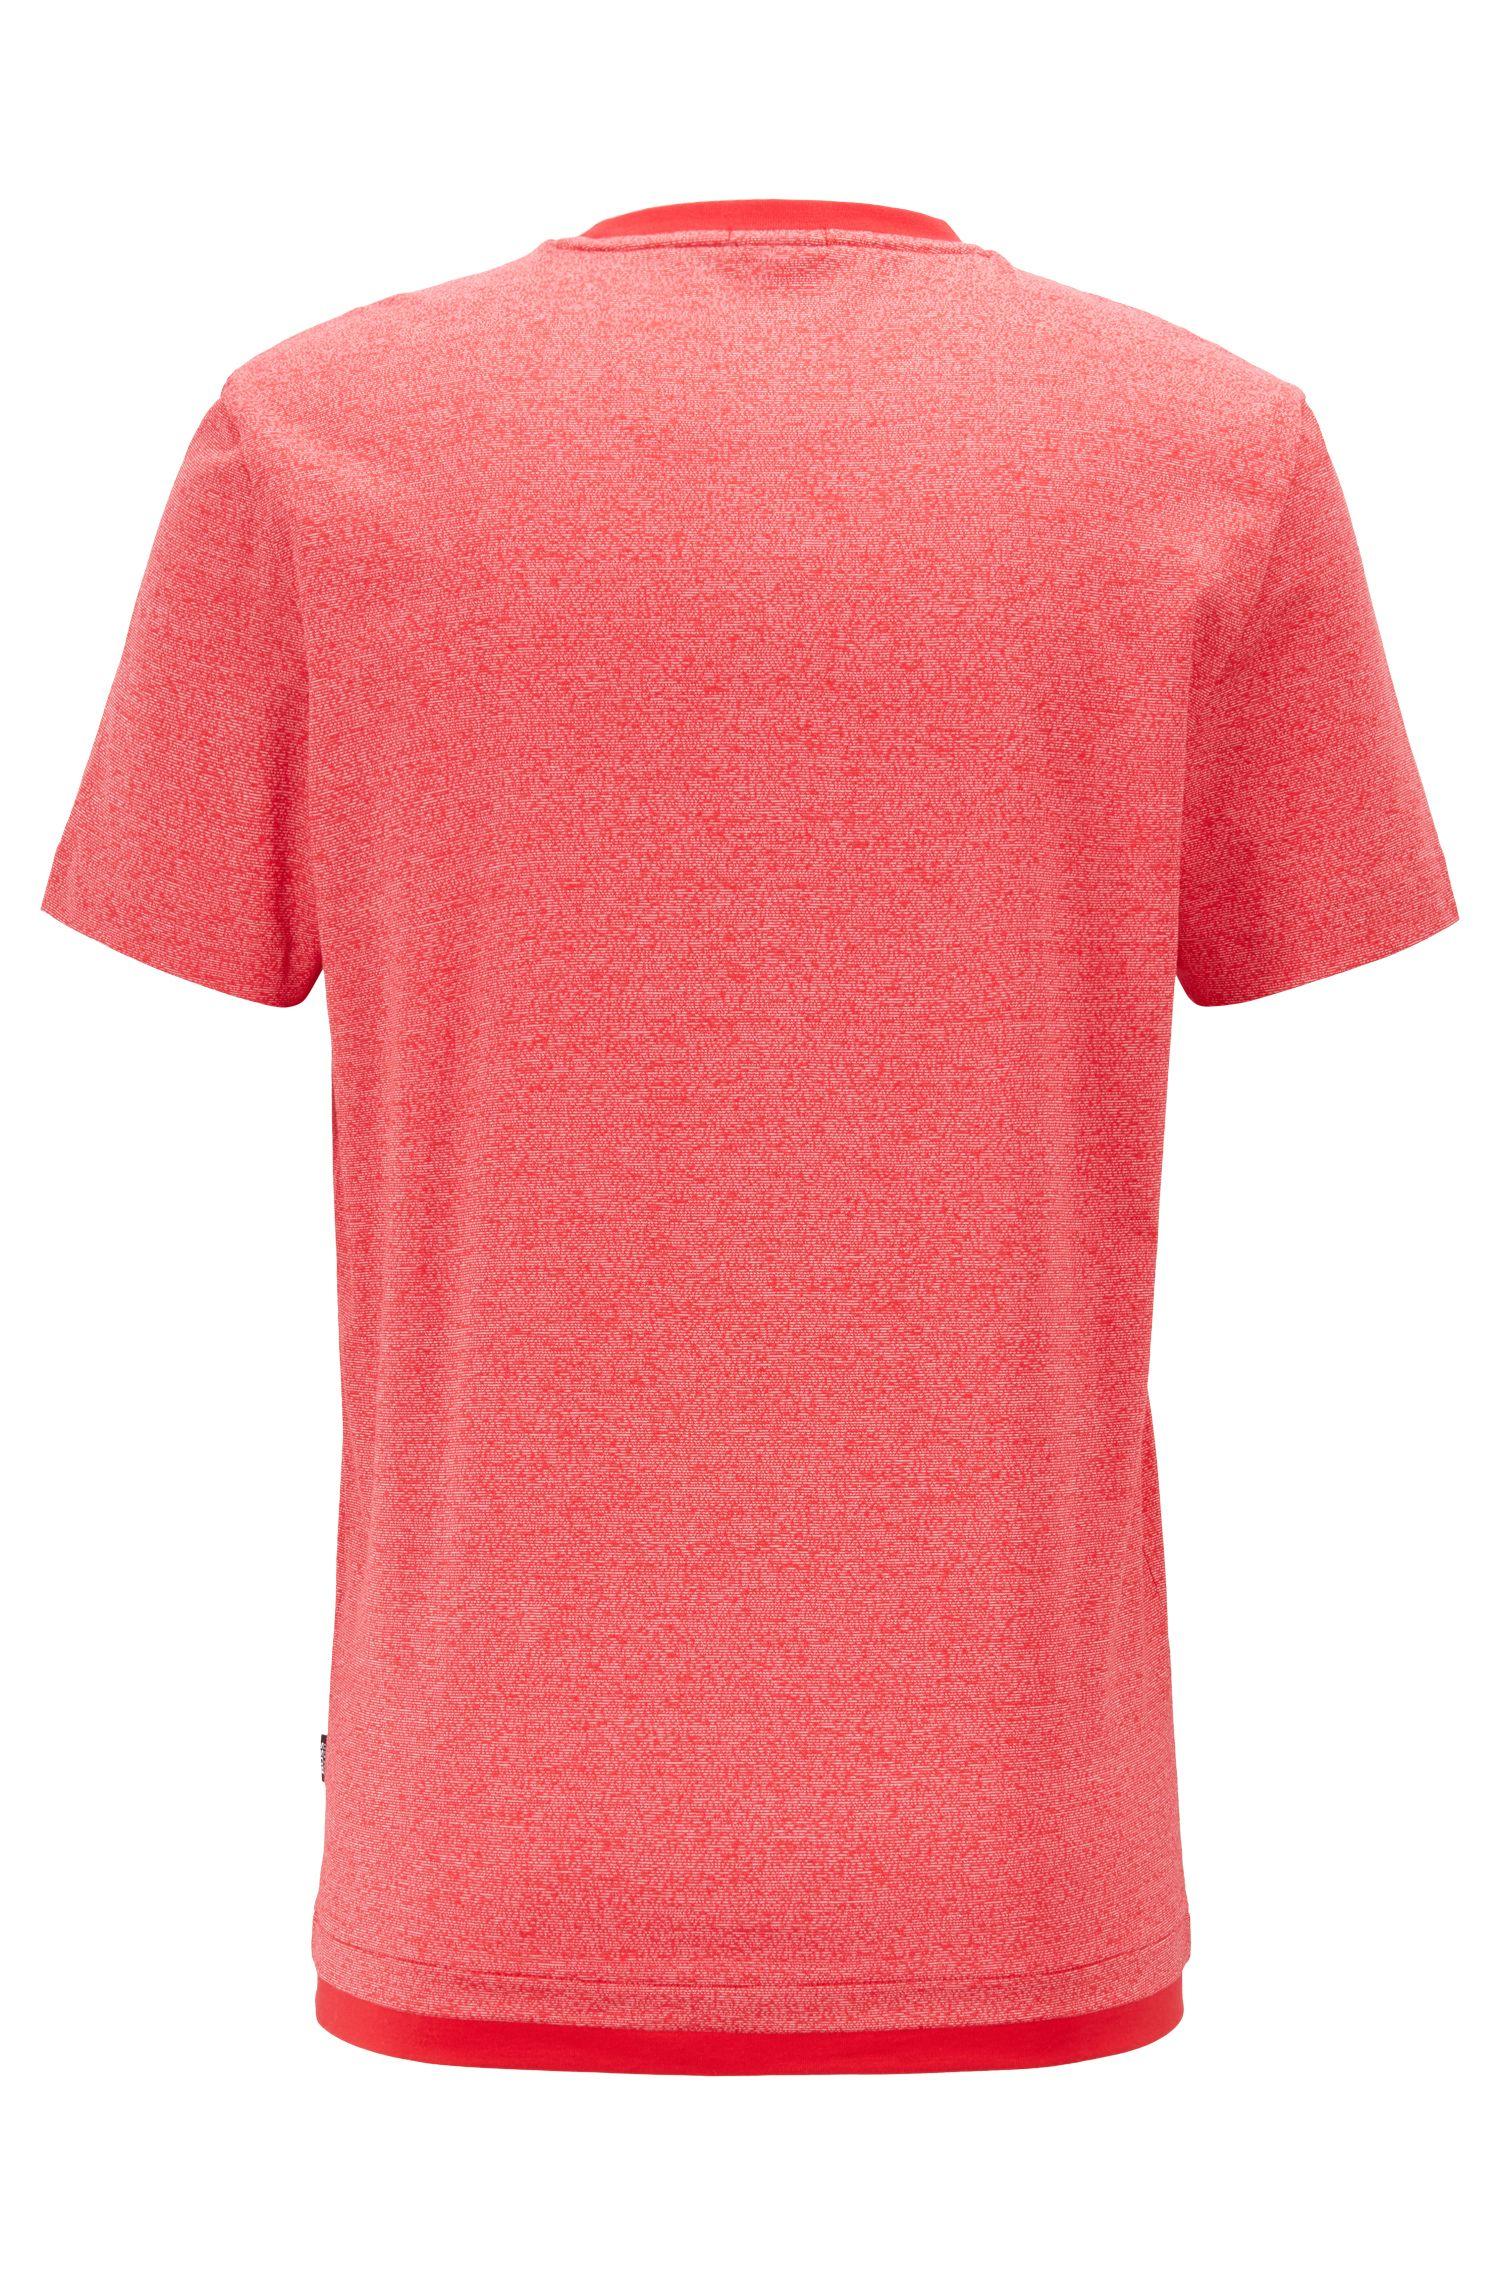 Slim-fit T-shirt in mercerized mouliné cotton, Red